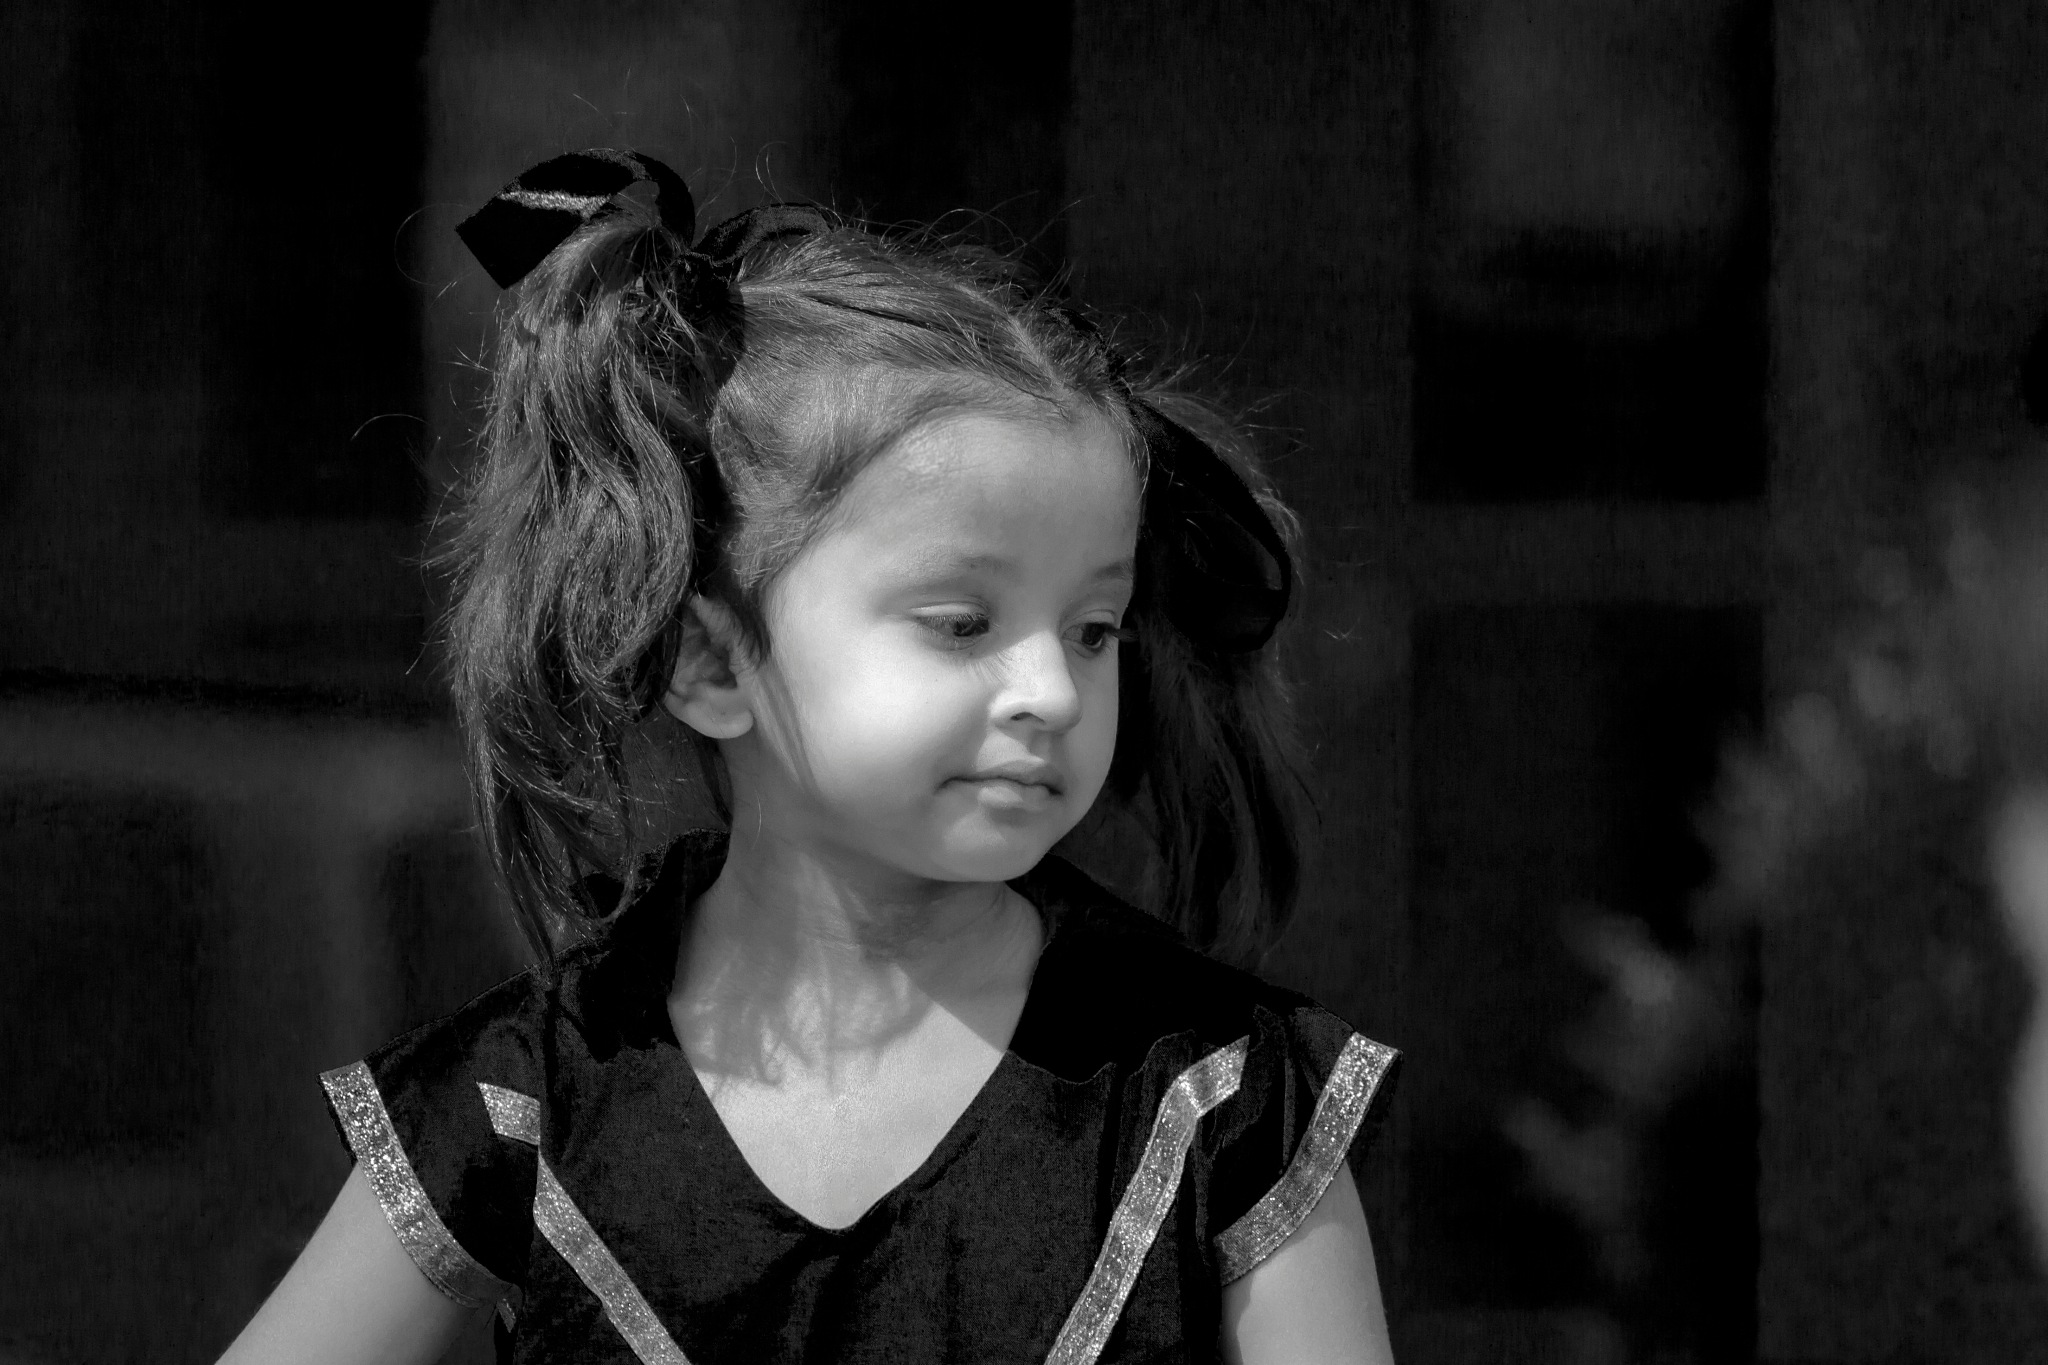 Young Girl by robertullmann